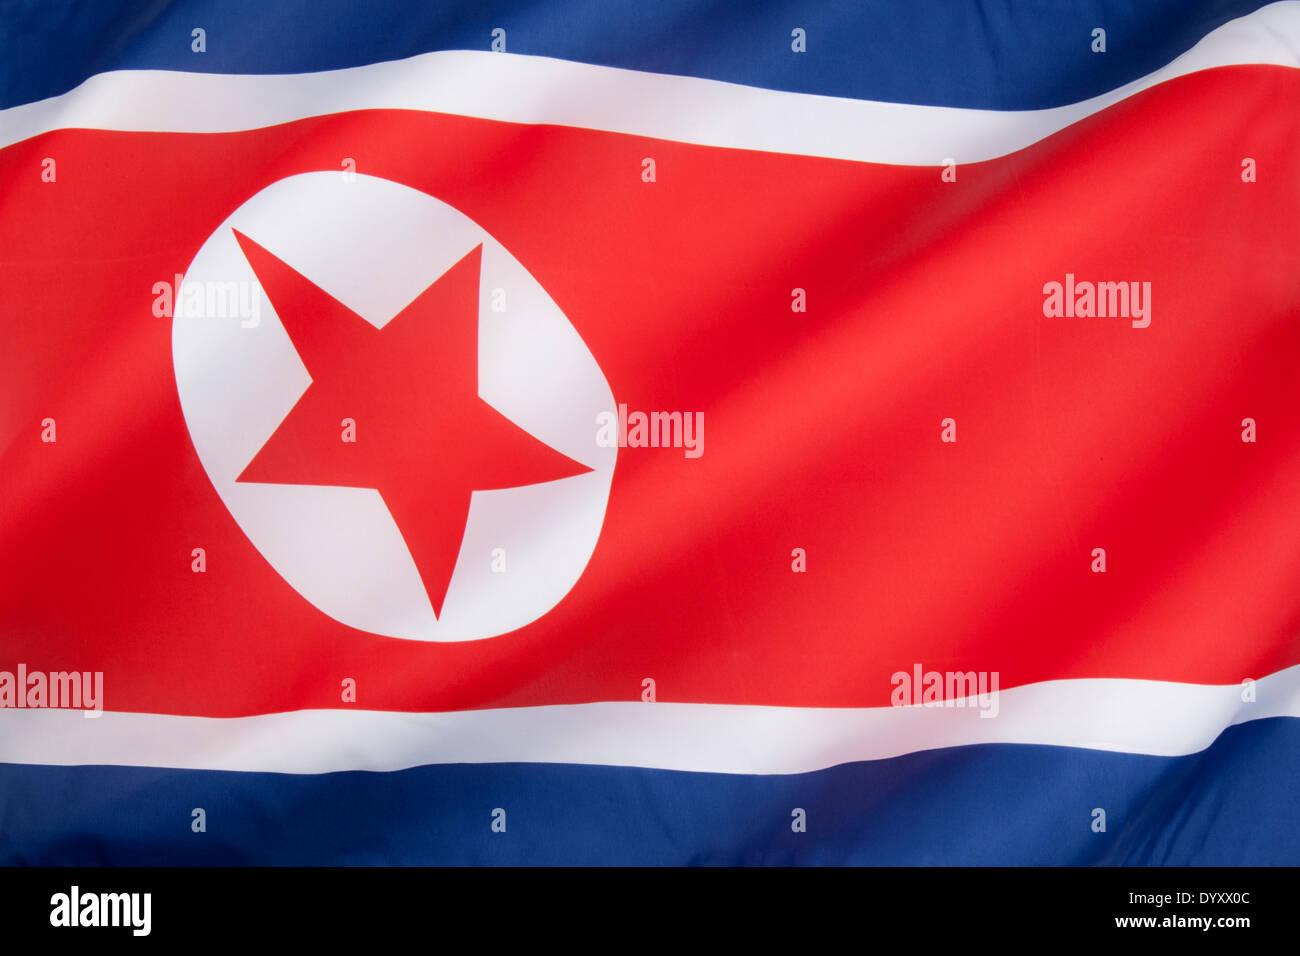 The flag of North Korea - Stock Image